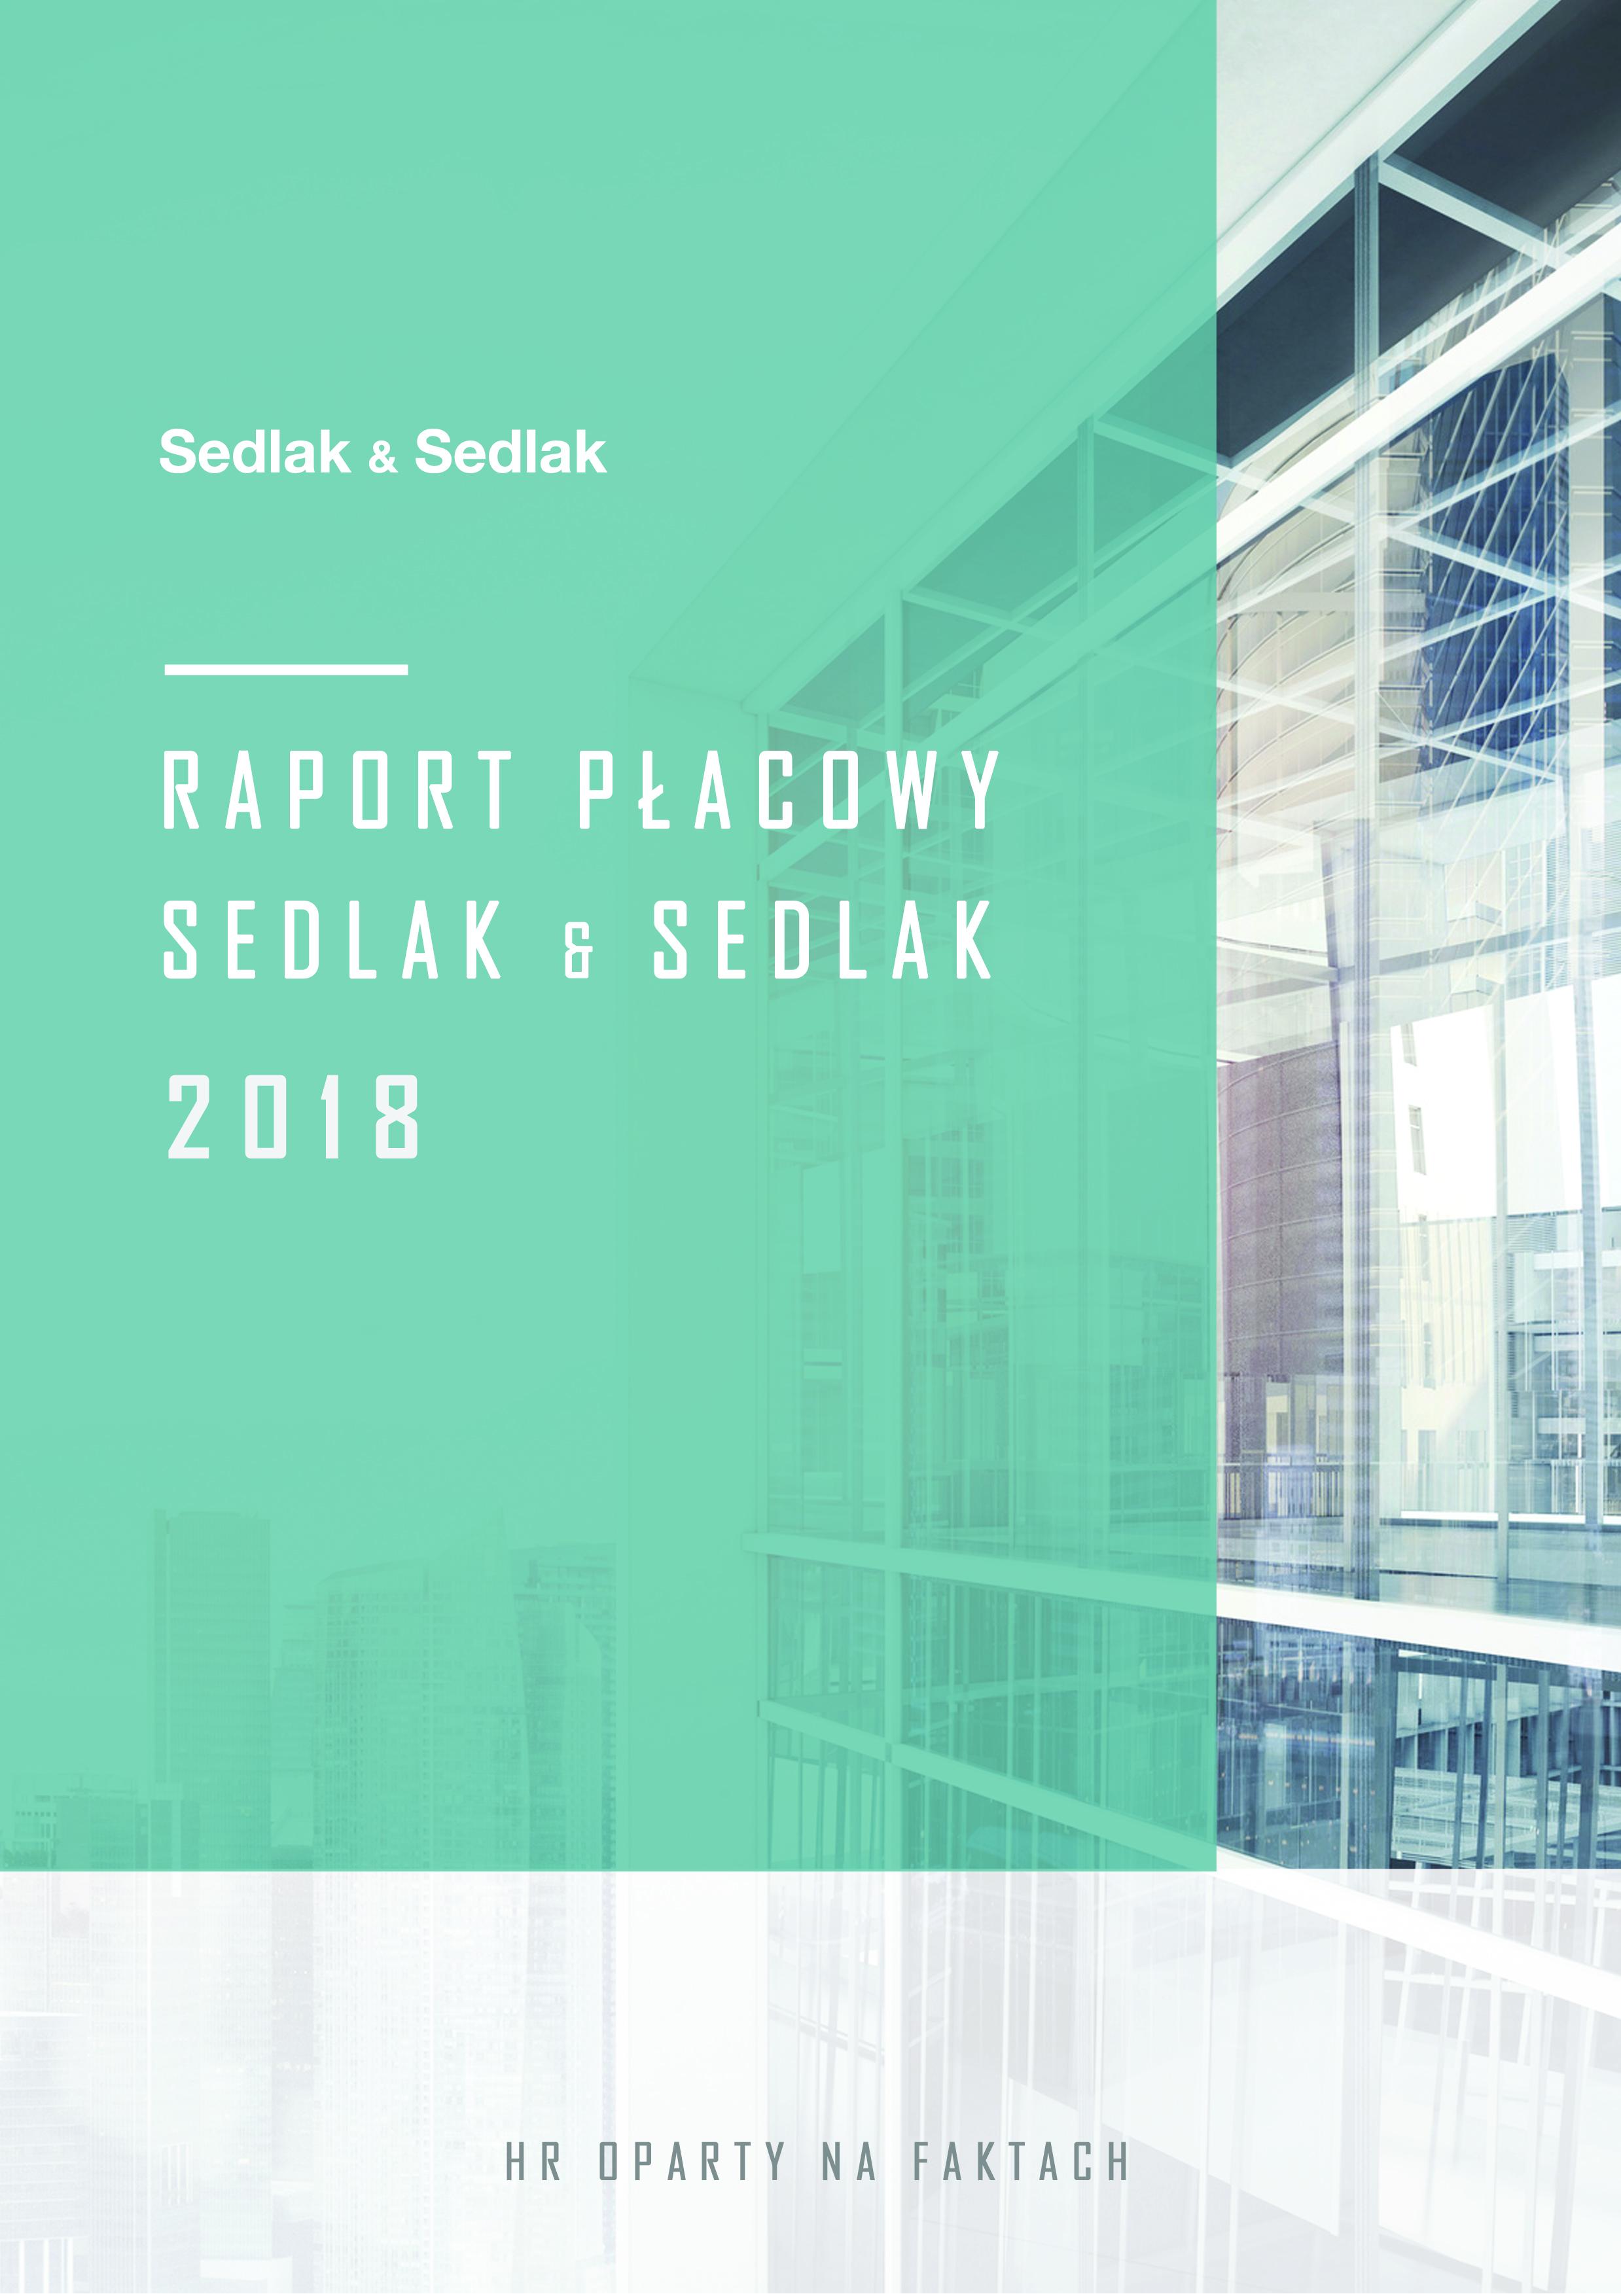 Raport płacowy Sedlak & Sedlak 2018